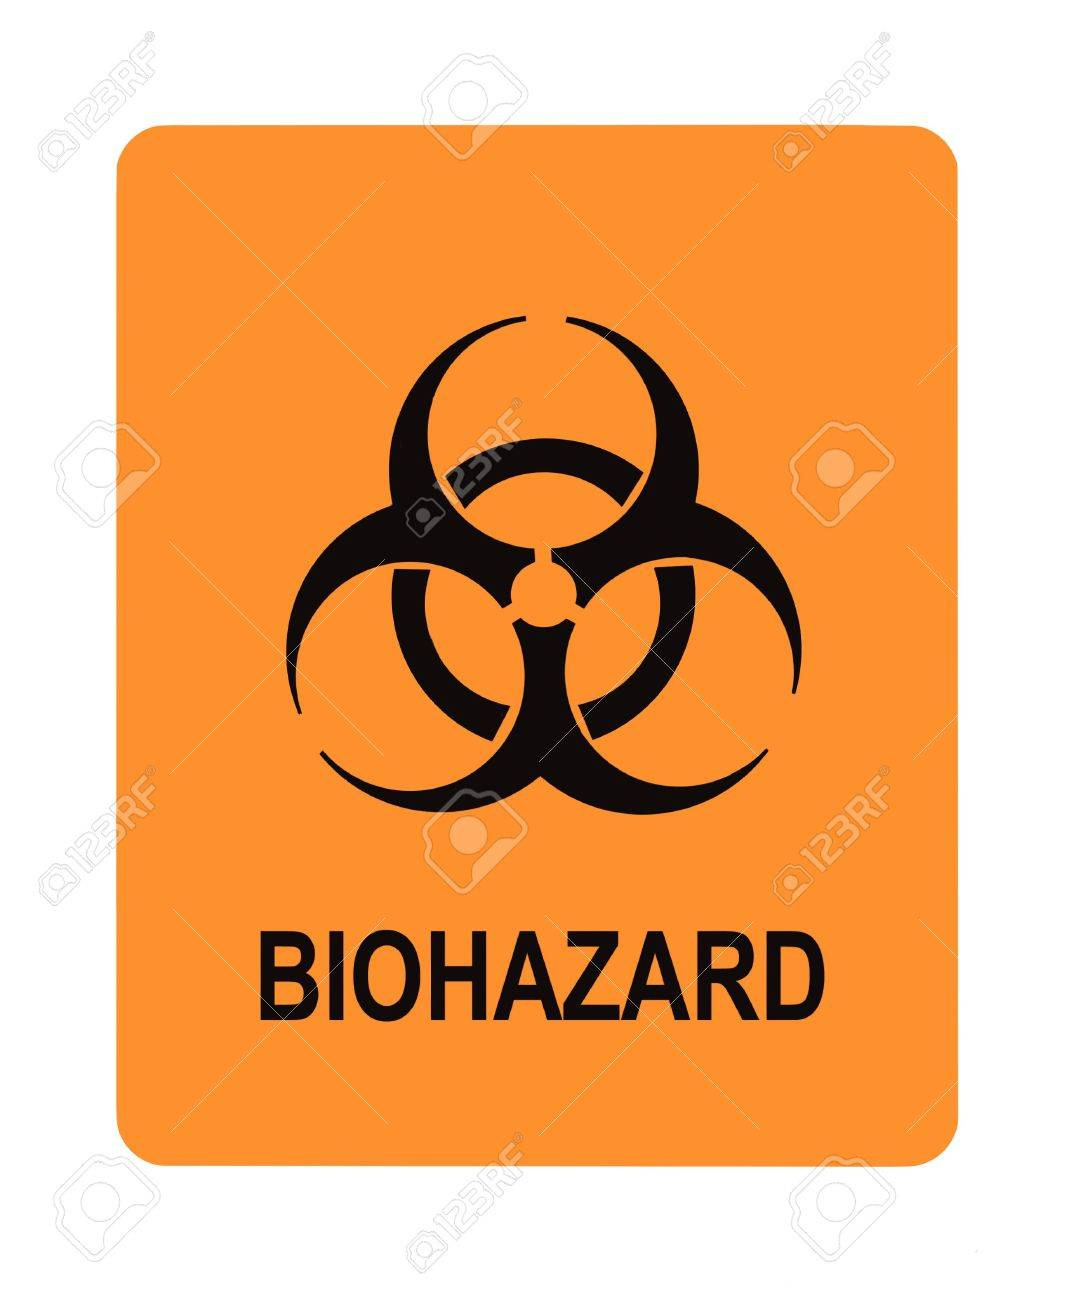 United States Department of Transportation biohazard warning label isolated on white Stock Photo - 4620707